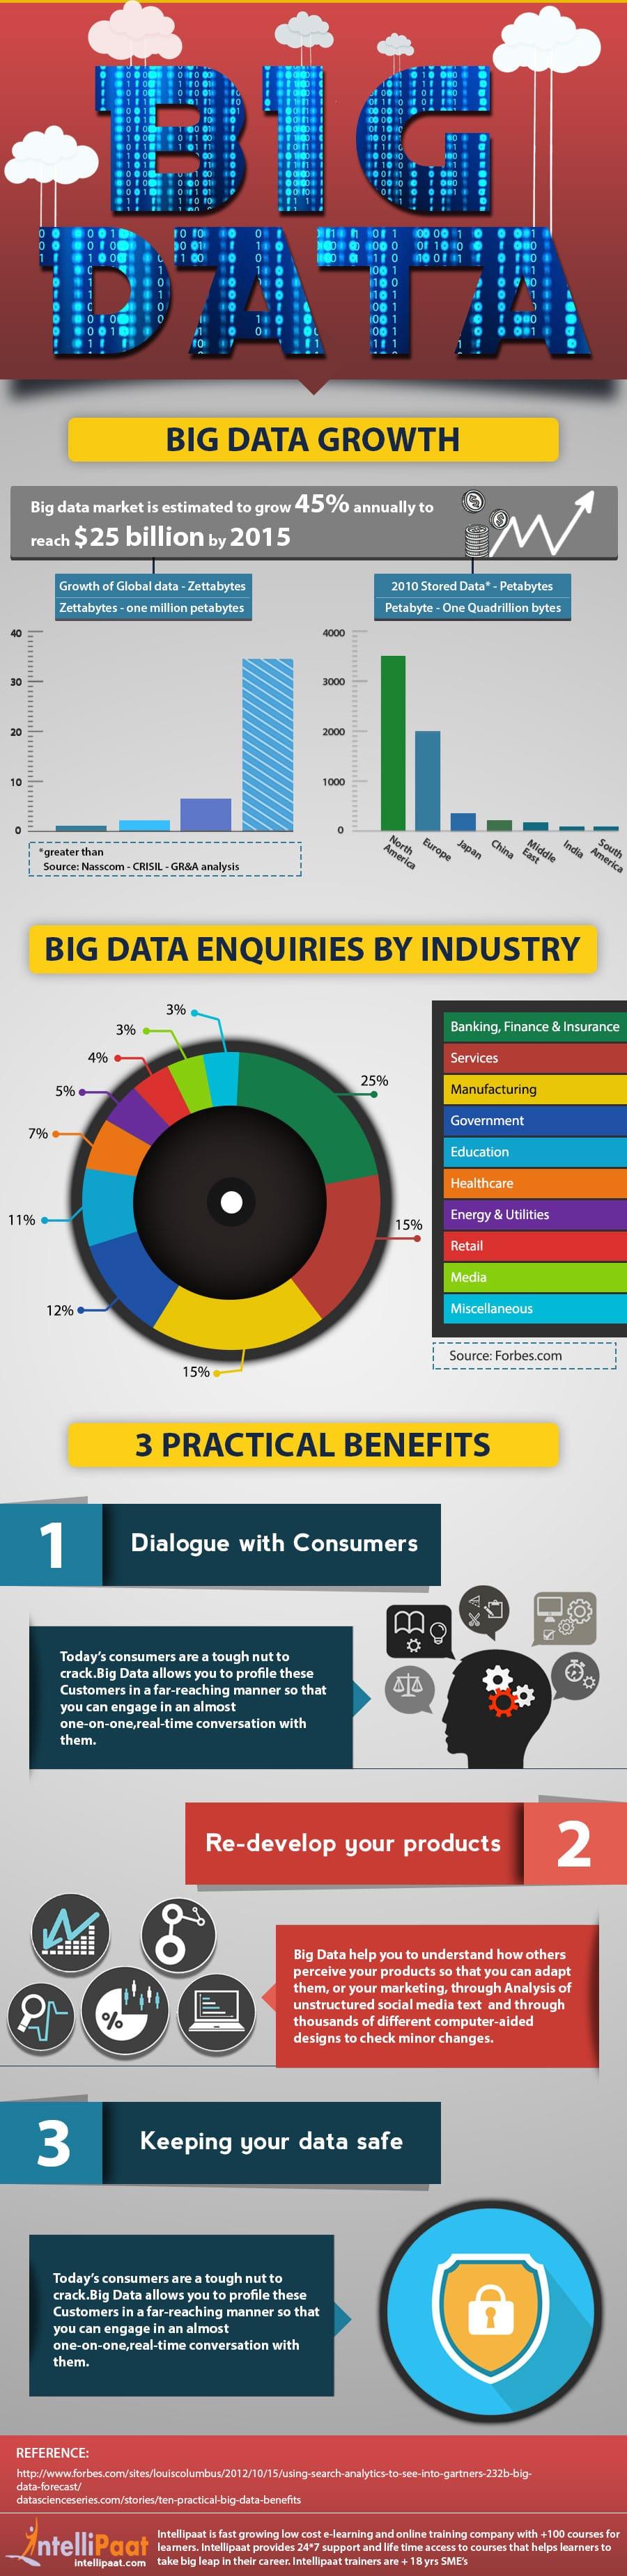 bigdata_infographic